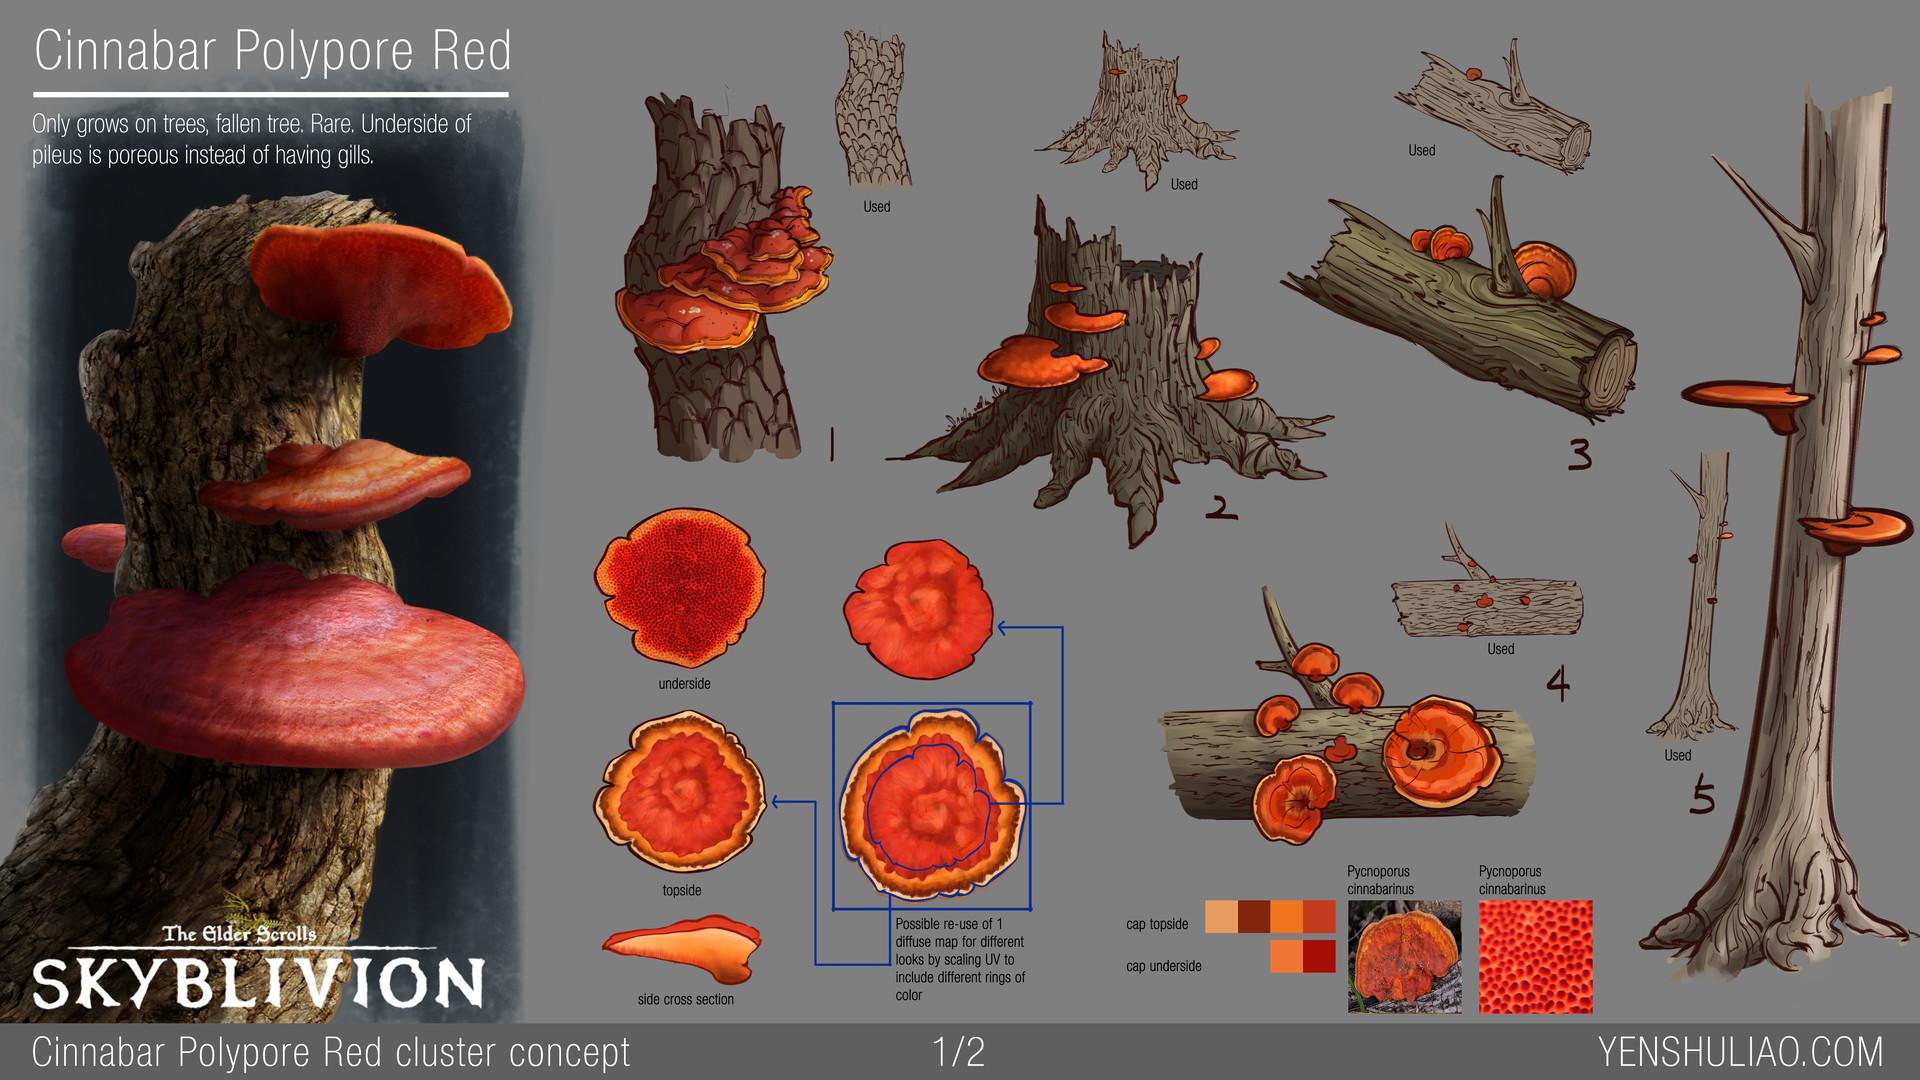 Yen shu liao mushroom environment prop concept yen shu liao skyblivion cinnabarpolypore 01